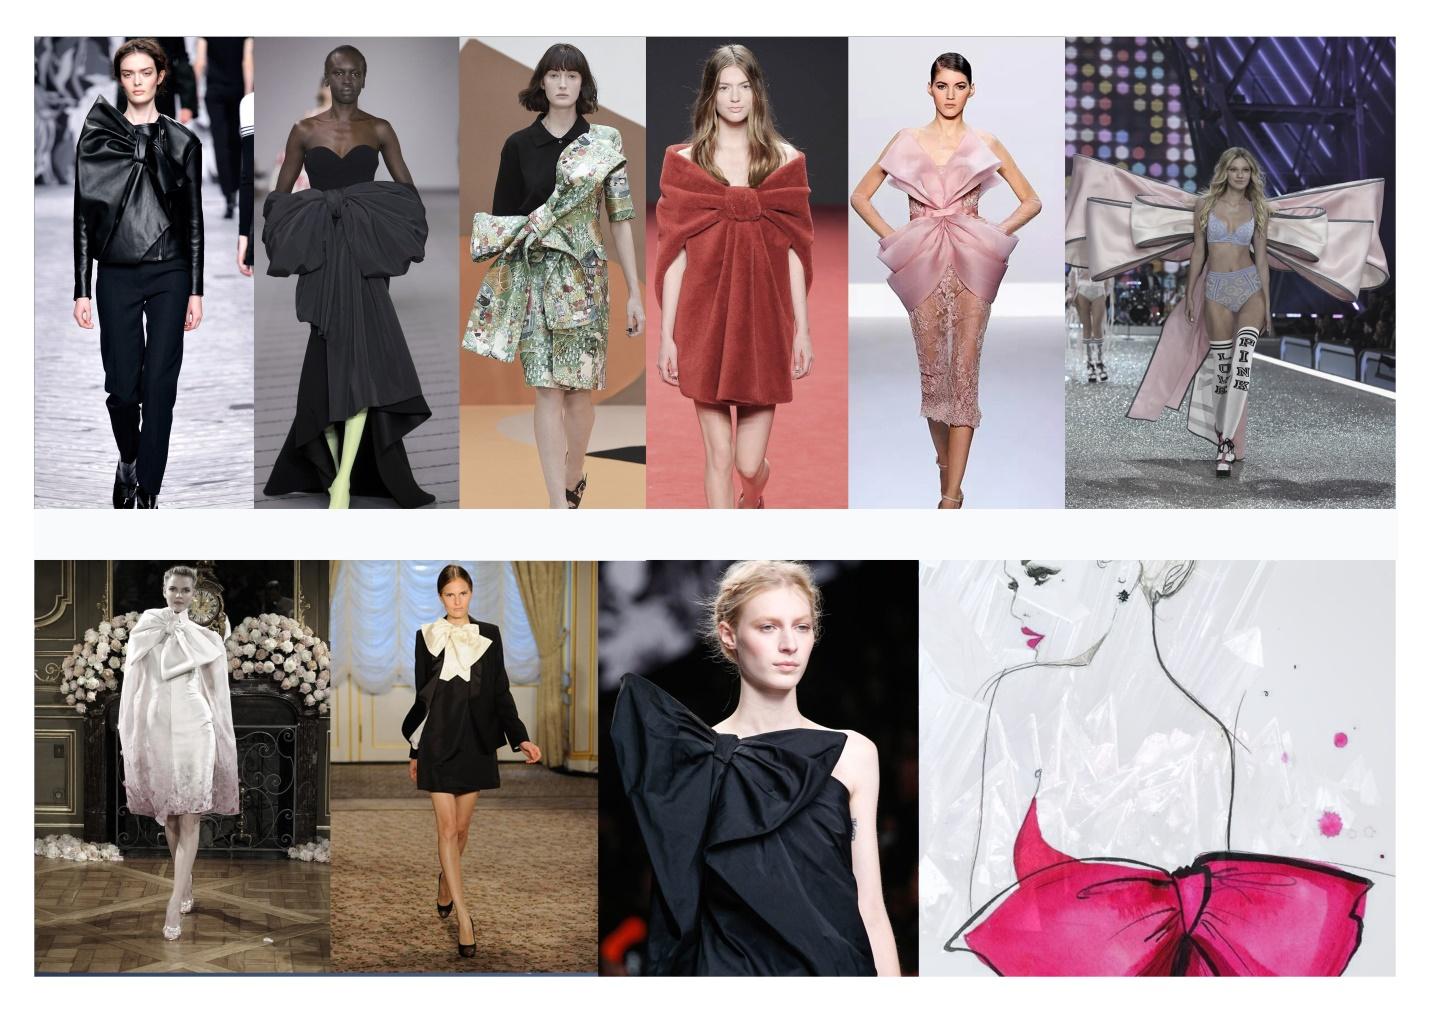 Quintessential Allure quintessential allure - QUINTESSENTIAL ALLURE   JD Annual Design Awards 2019 Fashion Design 4 - QUINTESSENTIAL ALLURE–JD Annual Design Awards 2019 | Fashion Design